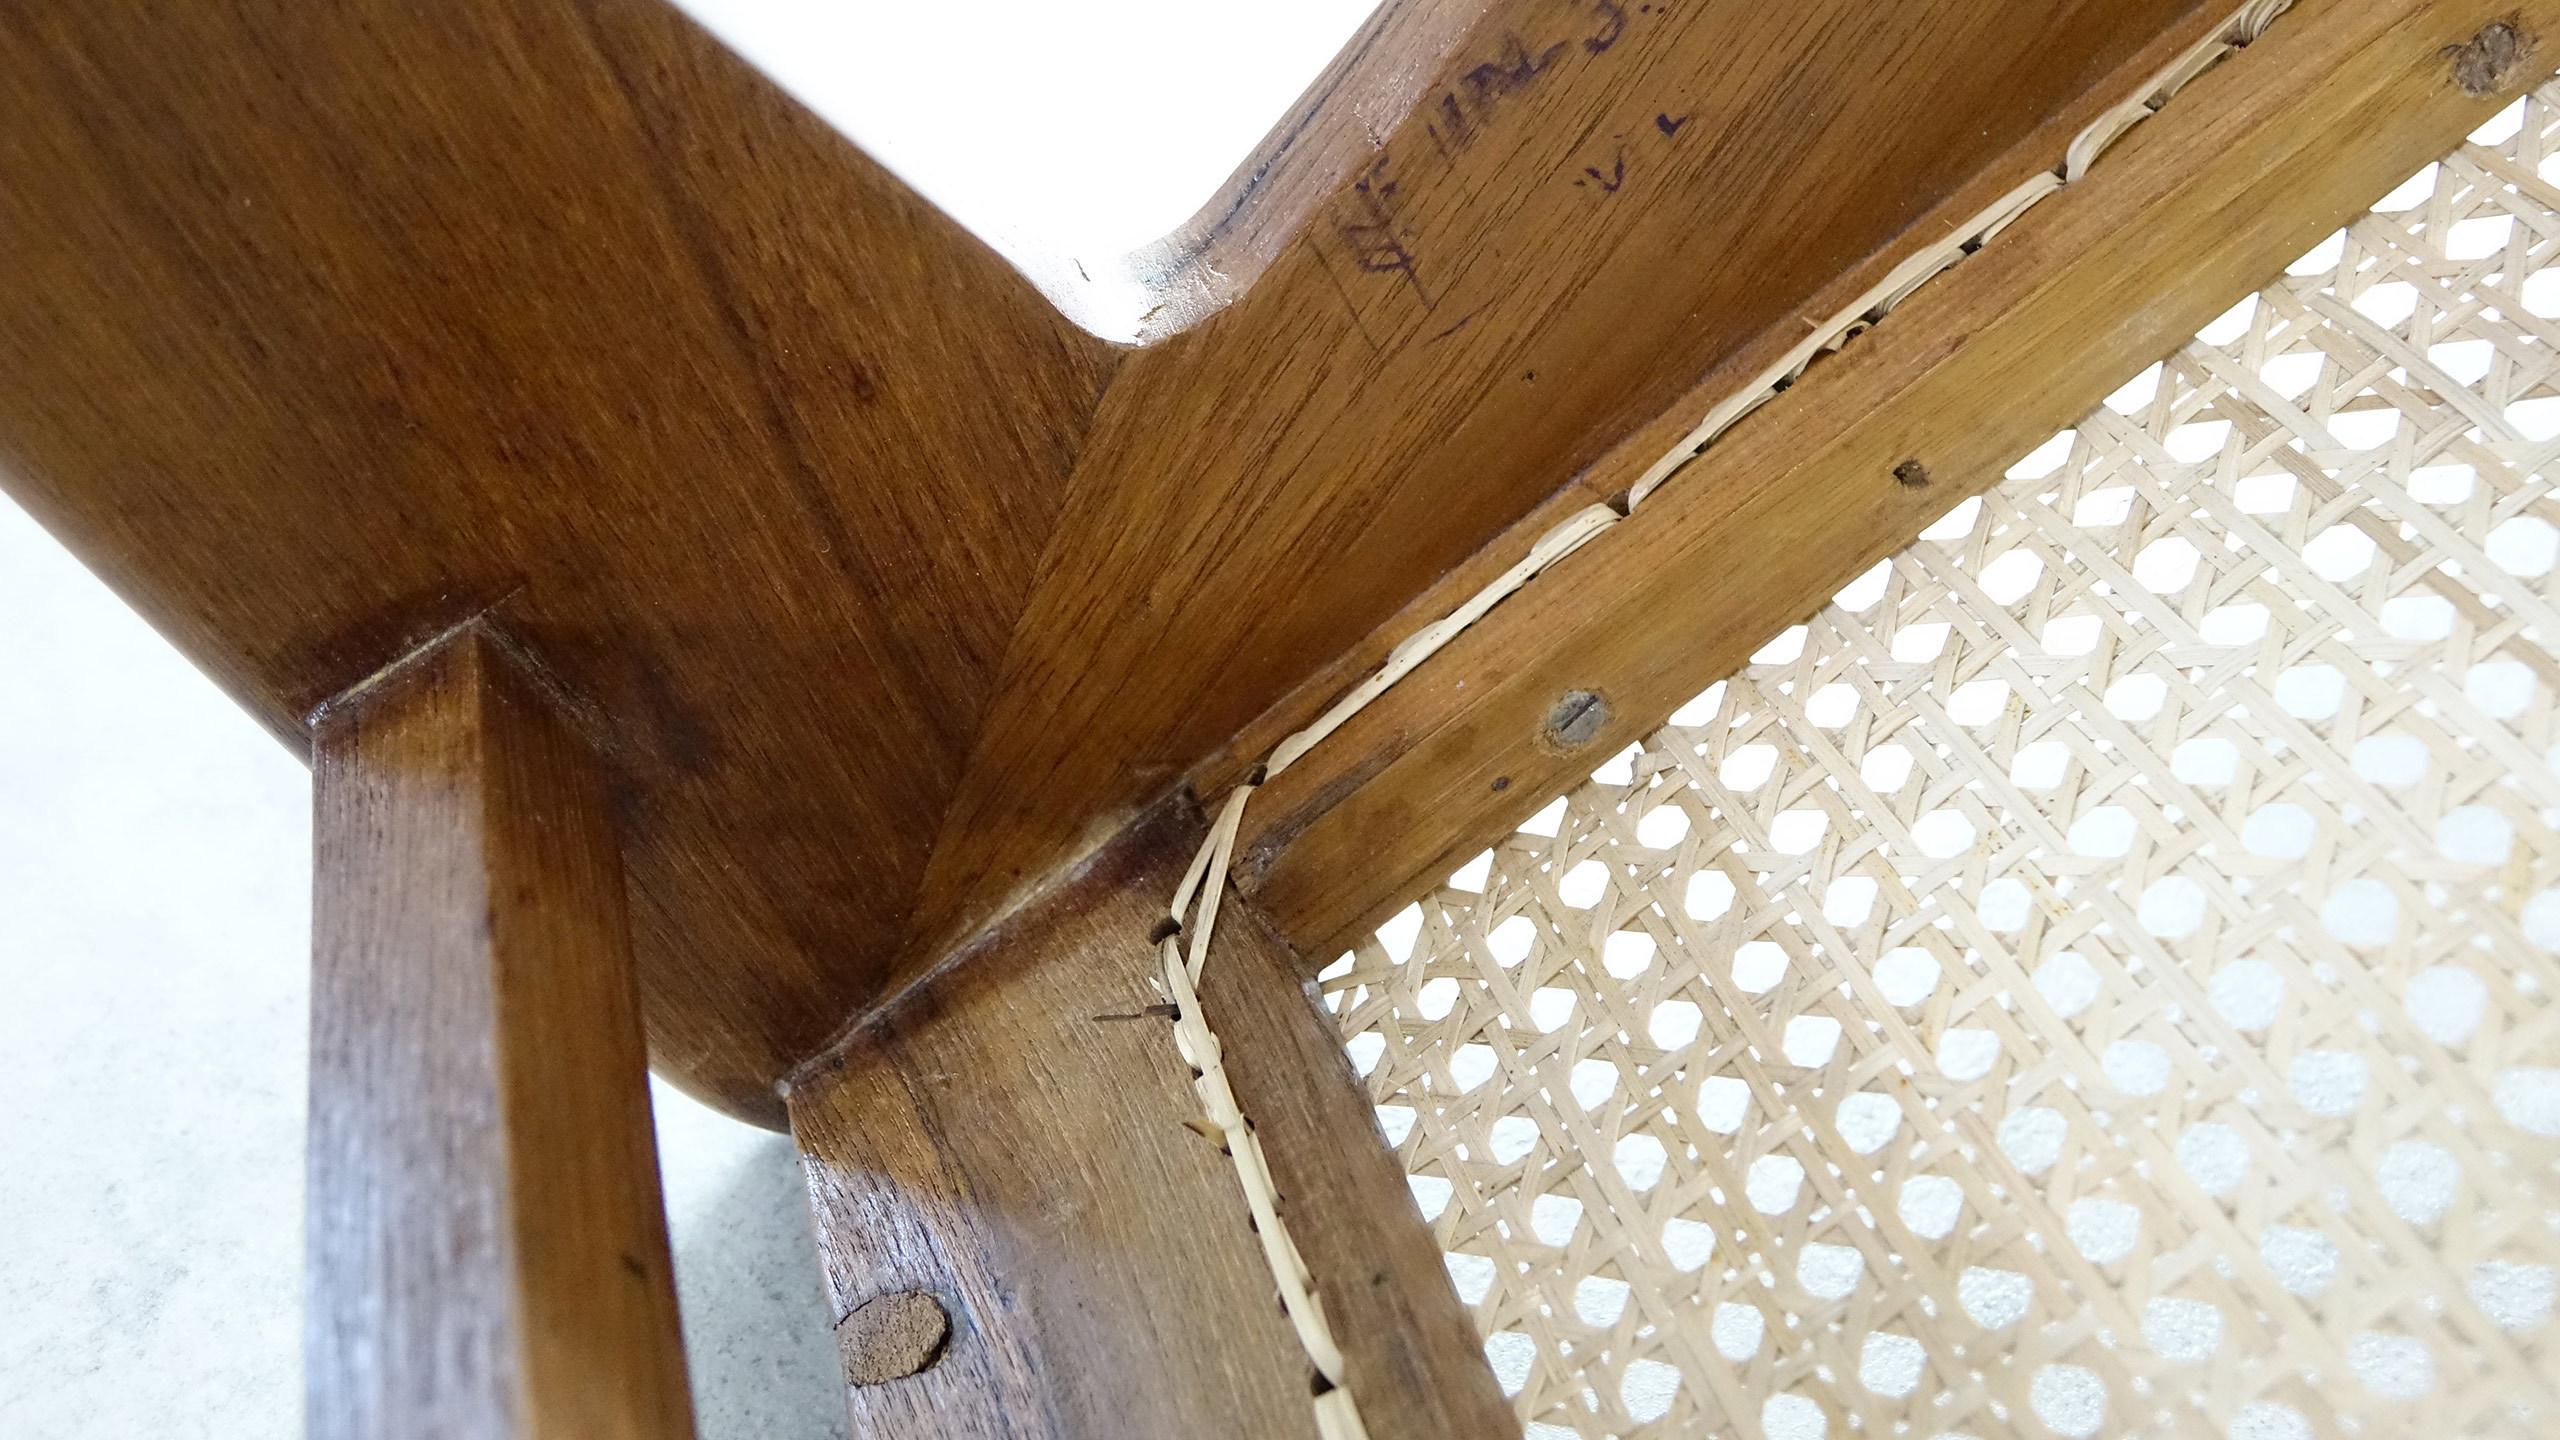 Pierre Jeanneret Kangourou Lounge Chair Chandigarh